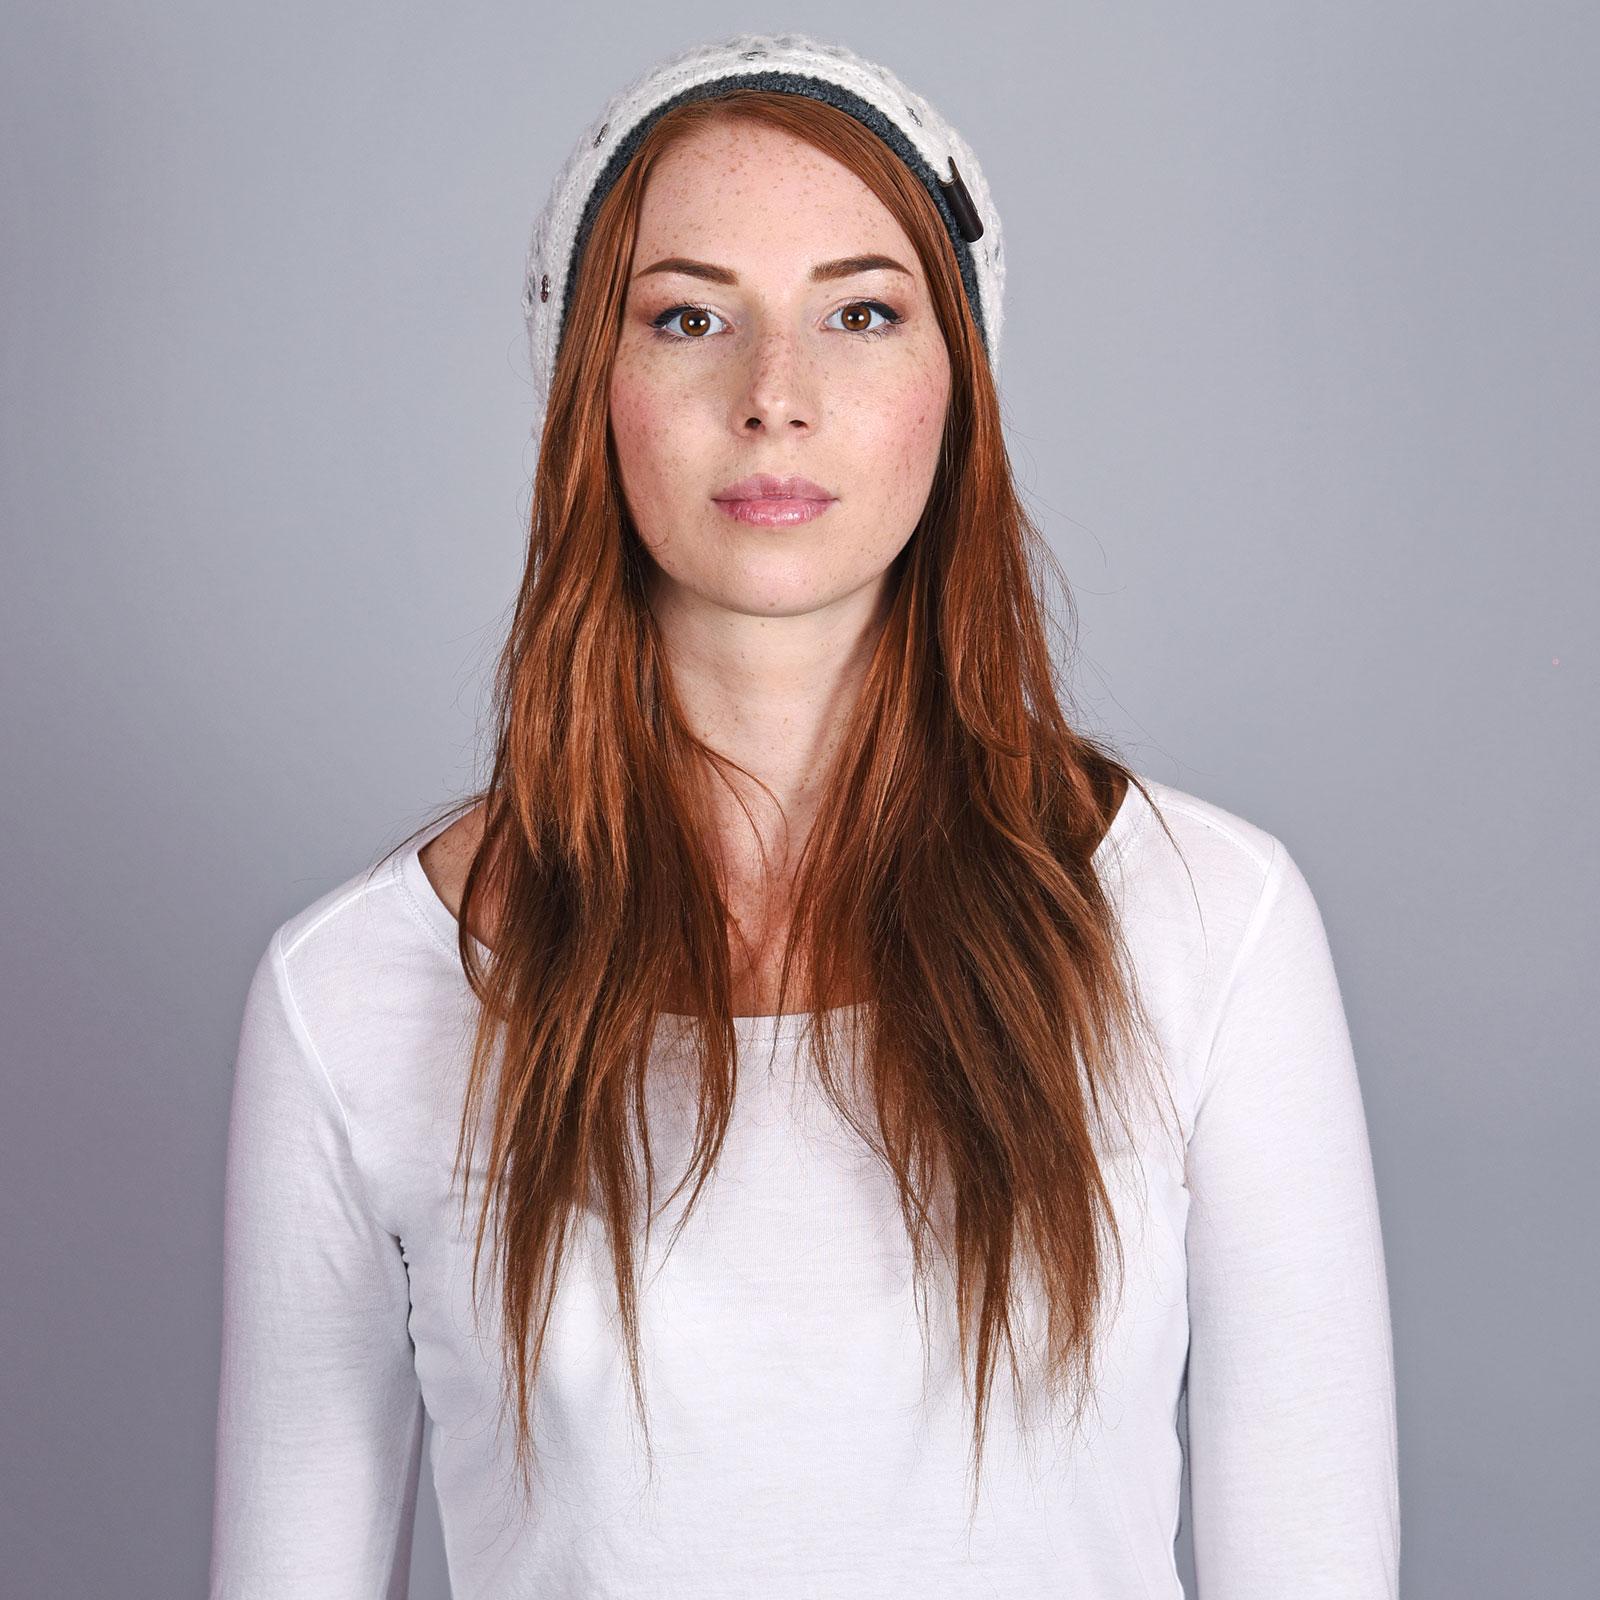 CP-01056-VF16-2-bonnet-femme-hiver-blanc